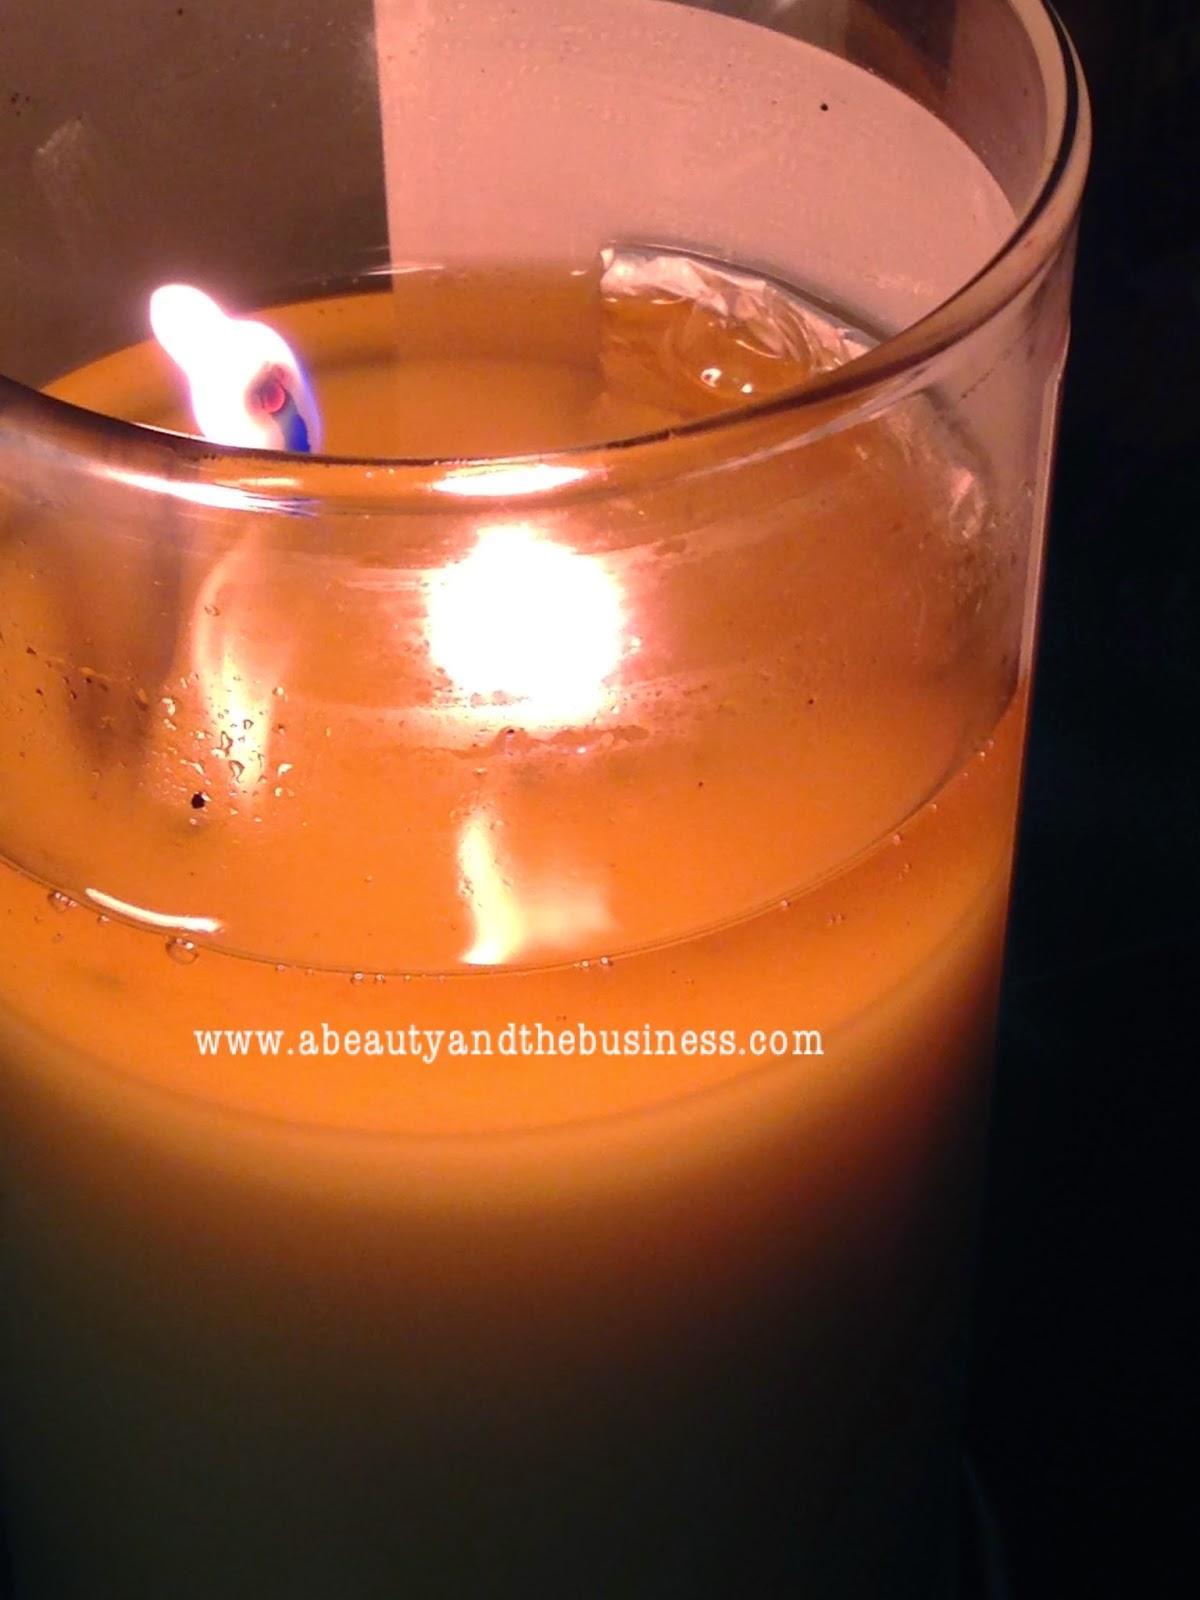 Jewelry Candle Creme Brûlée, Creme Brulee candle, jewelry candle, ring candle, creme brulee ring candle, creme brulee